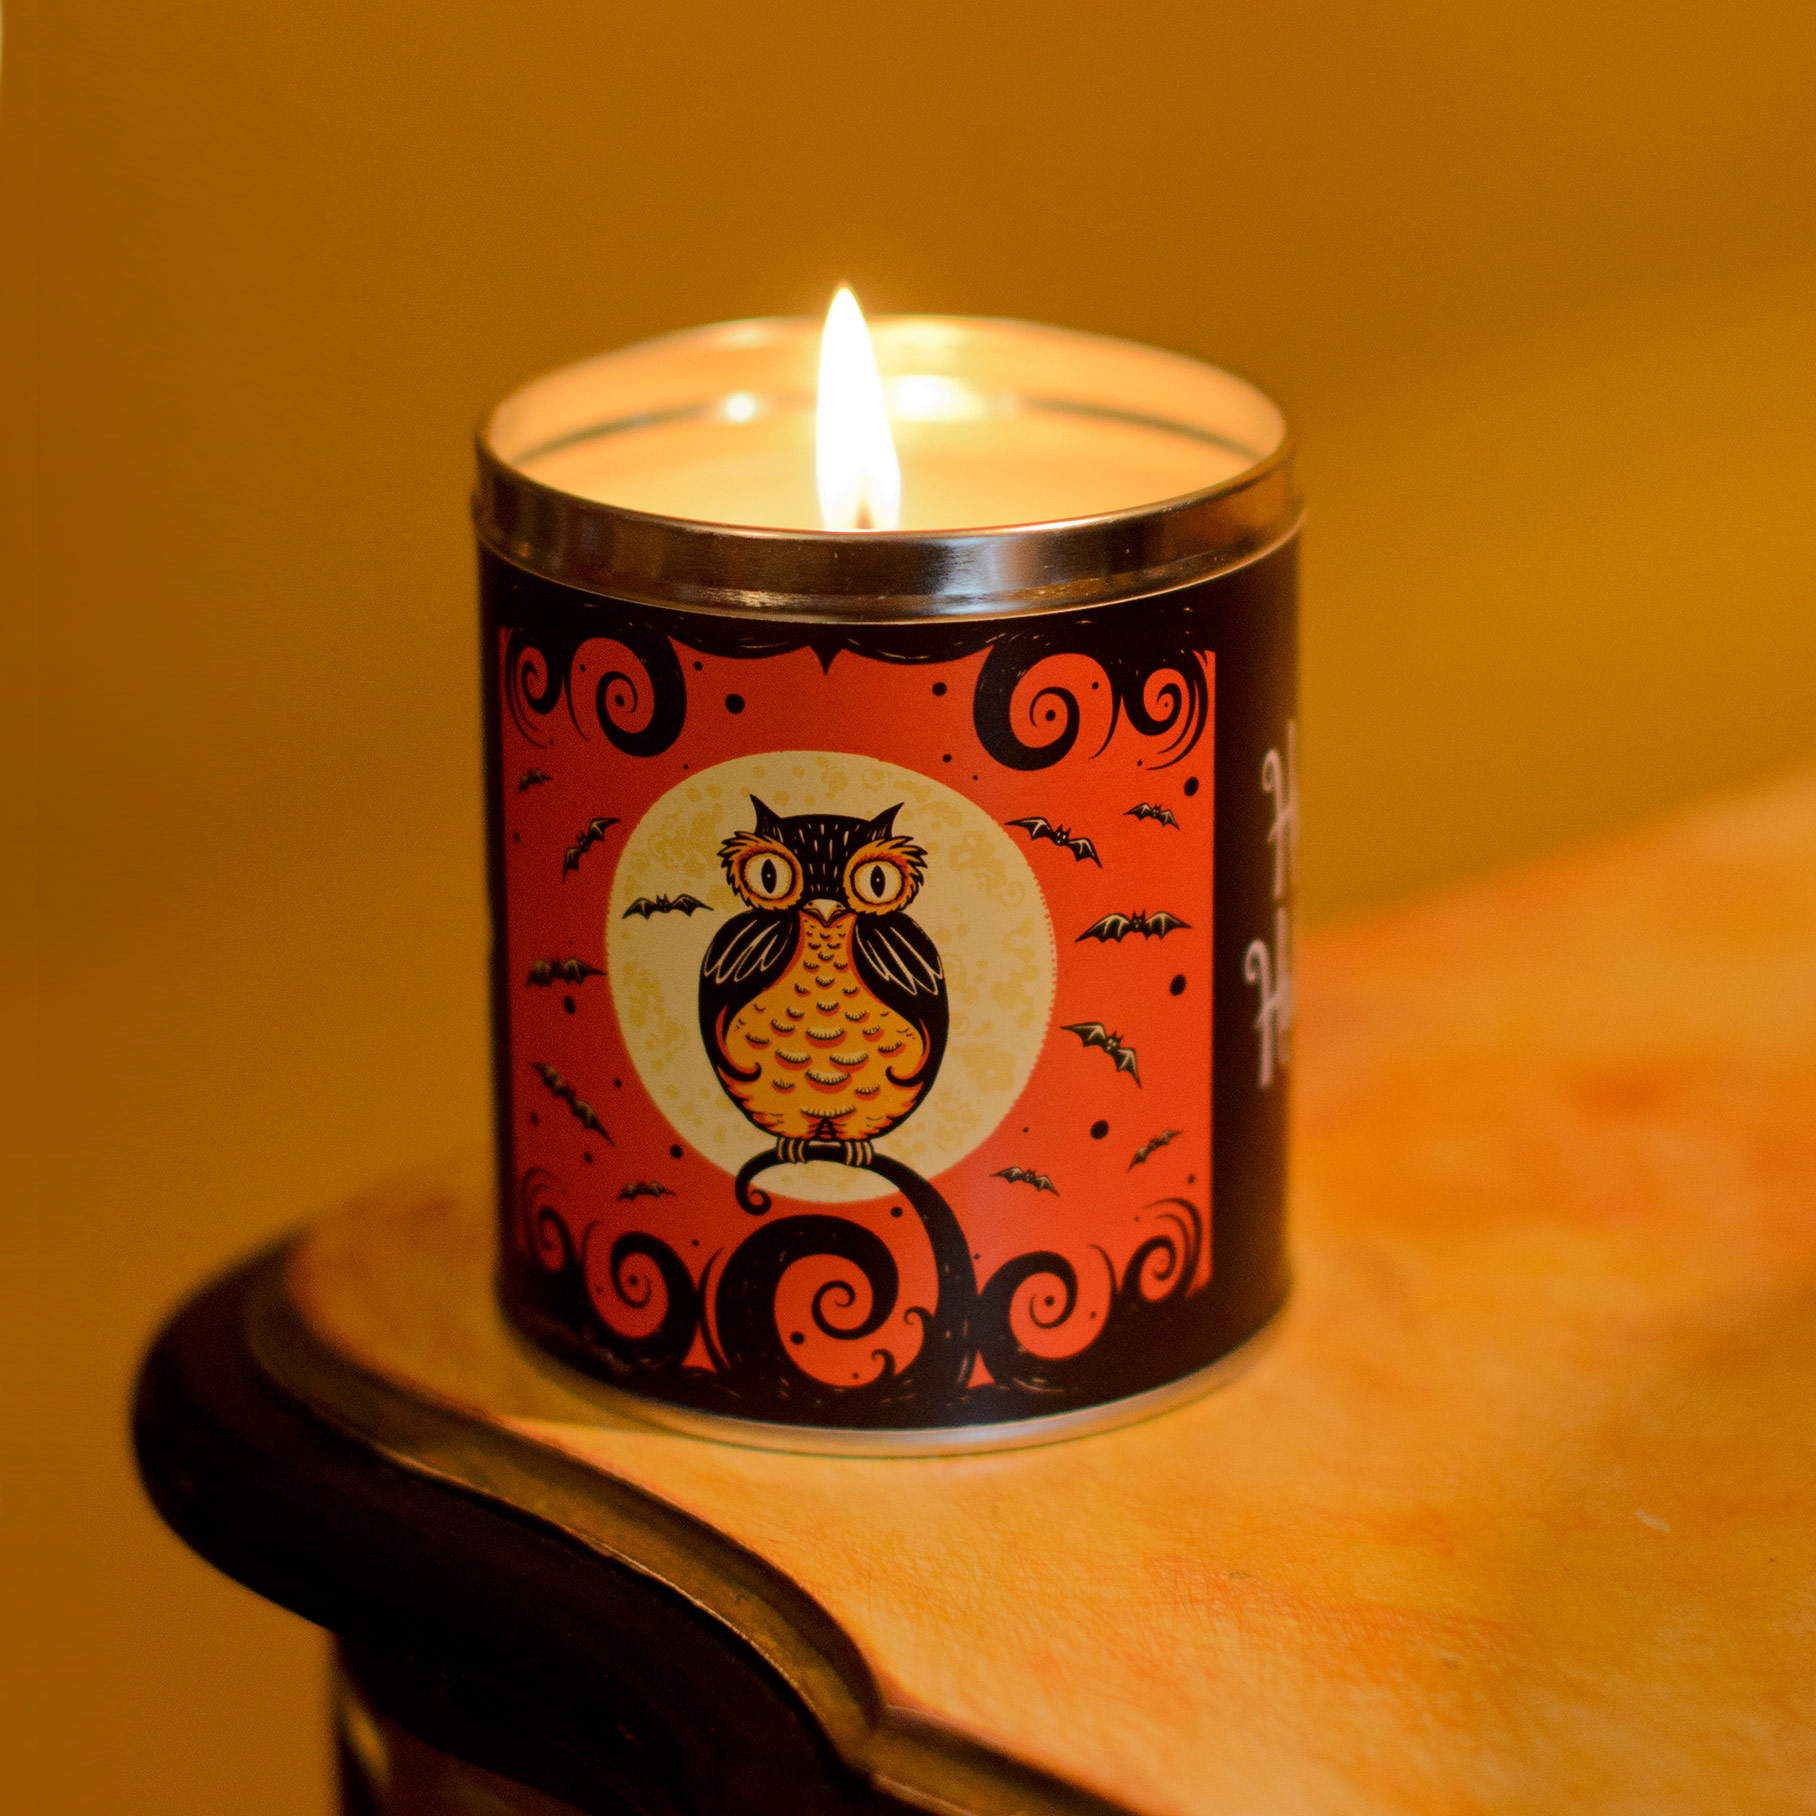 JPD Partners in Craft * Aunt Sadies Candles + Johanna Parker Design * Artist Collaboration